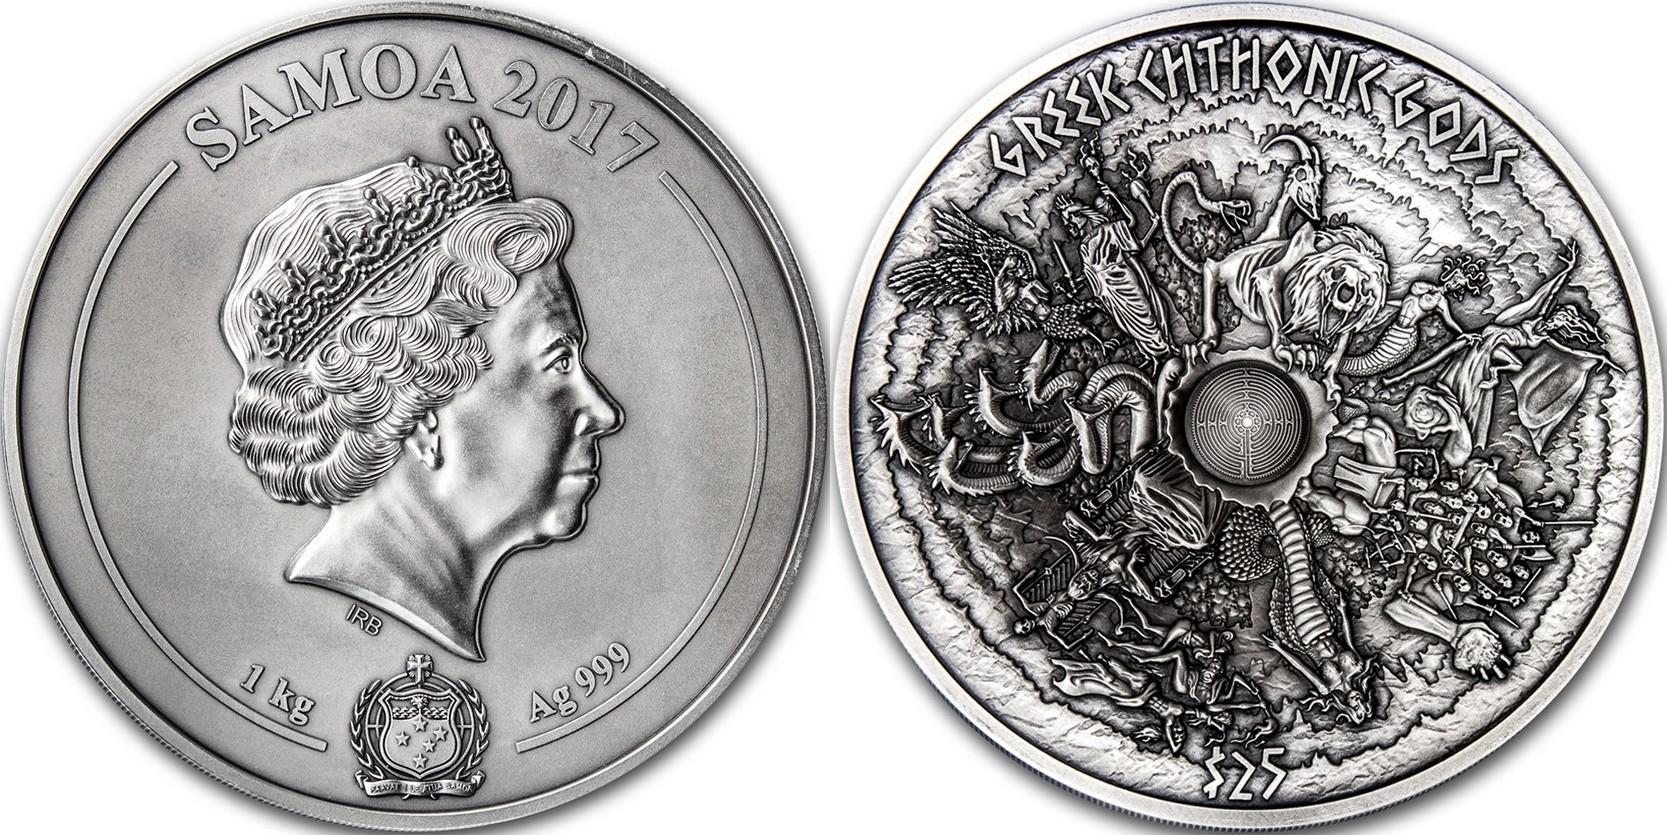 samoa 2017 dieux grecs chtoniens kg